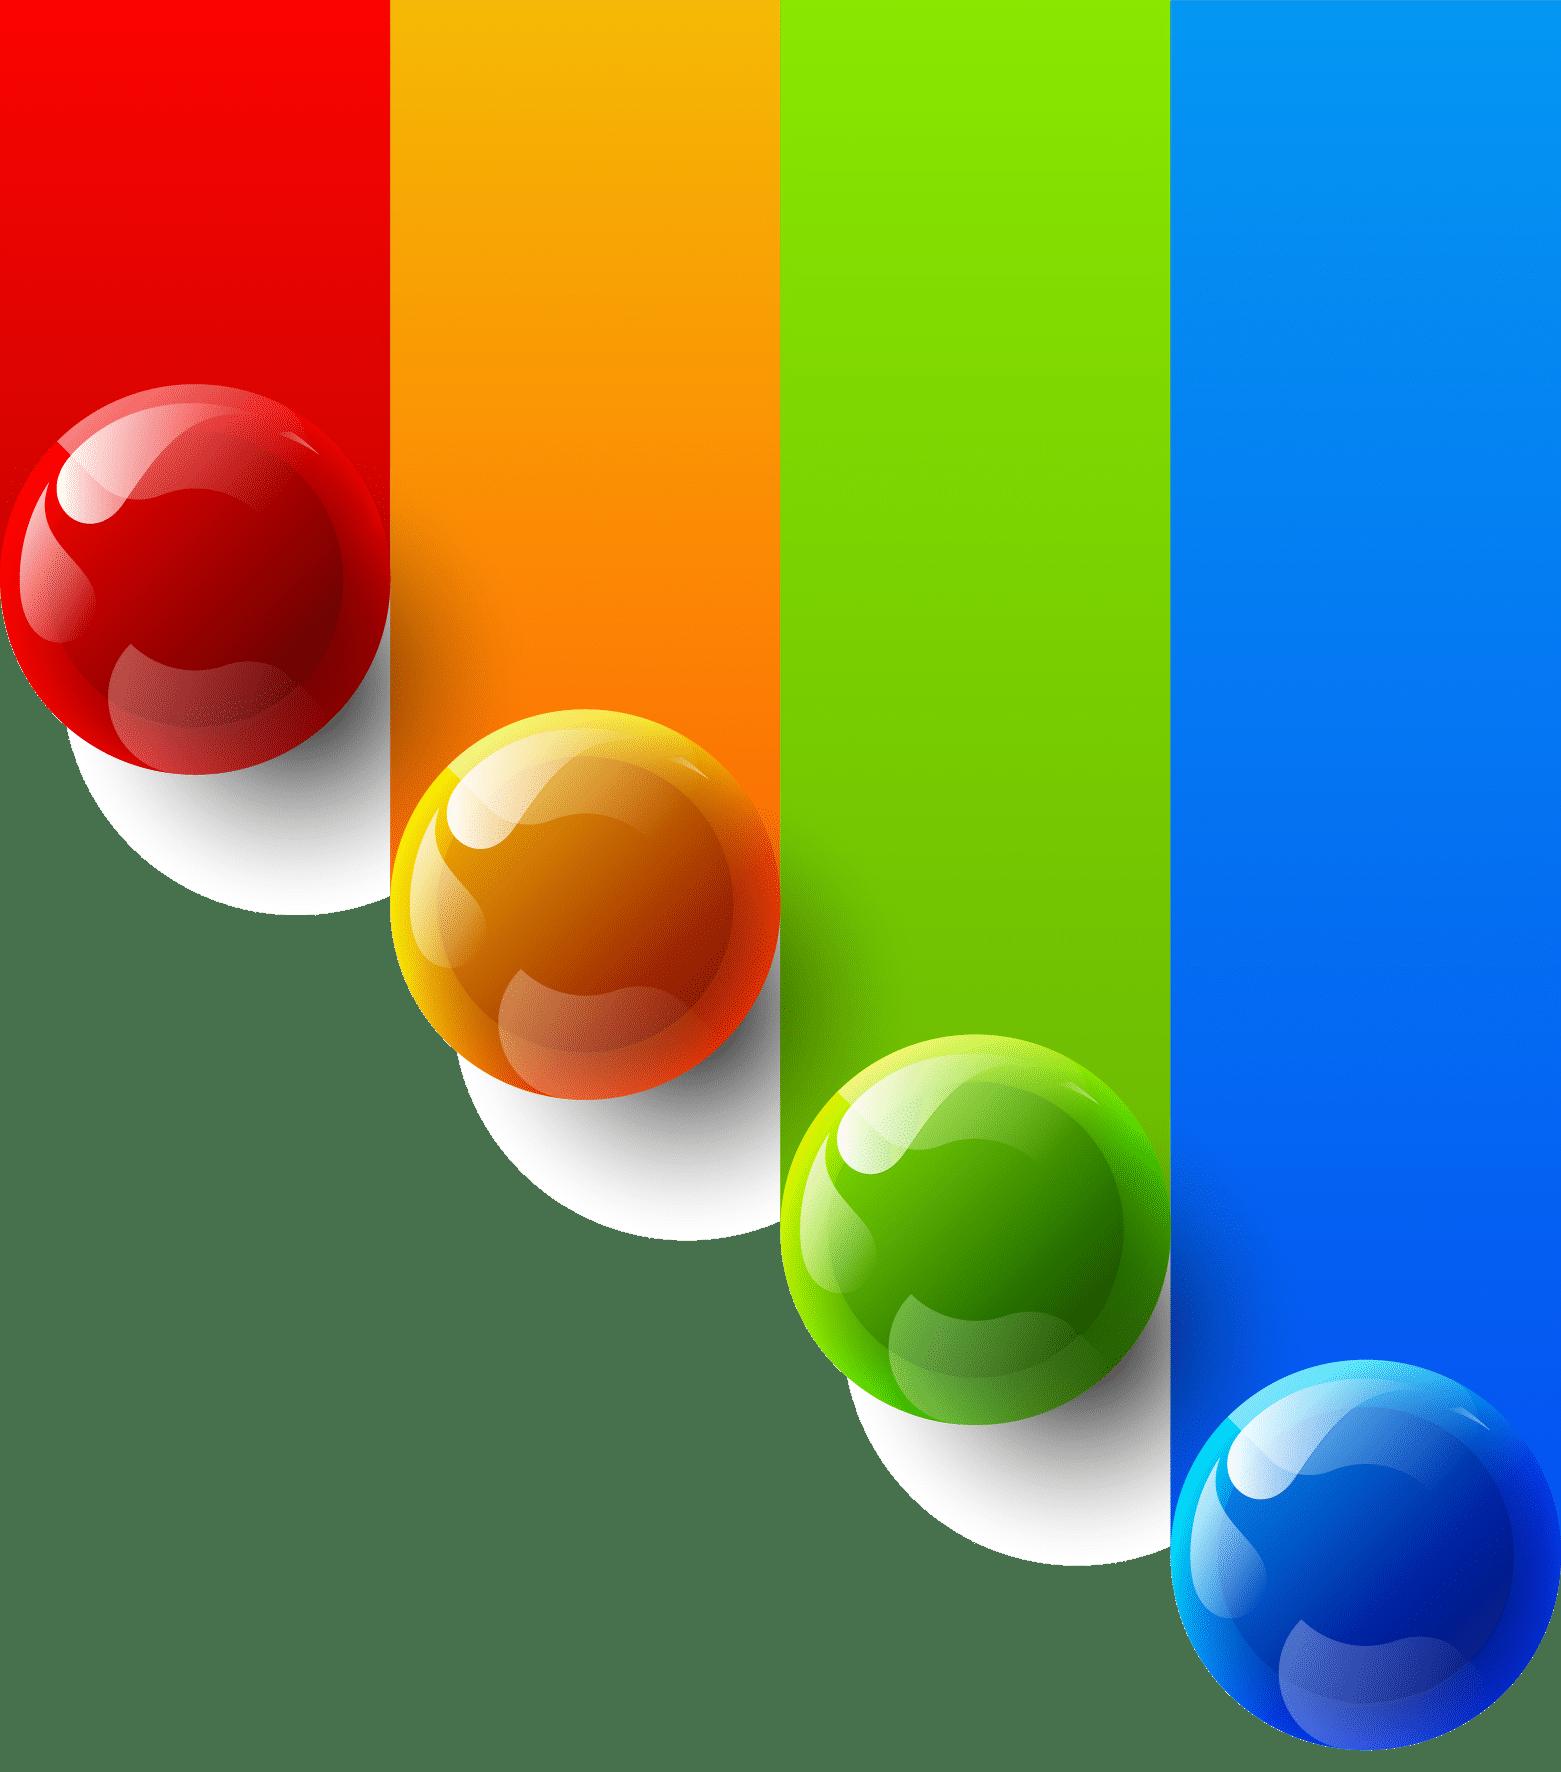 Color Corporate Design 7i7